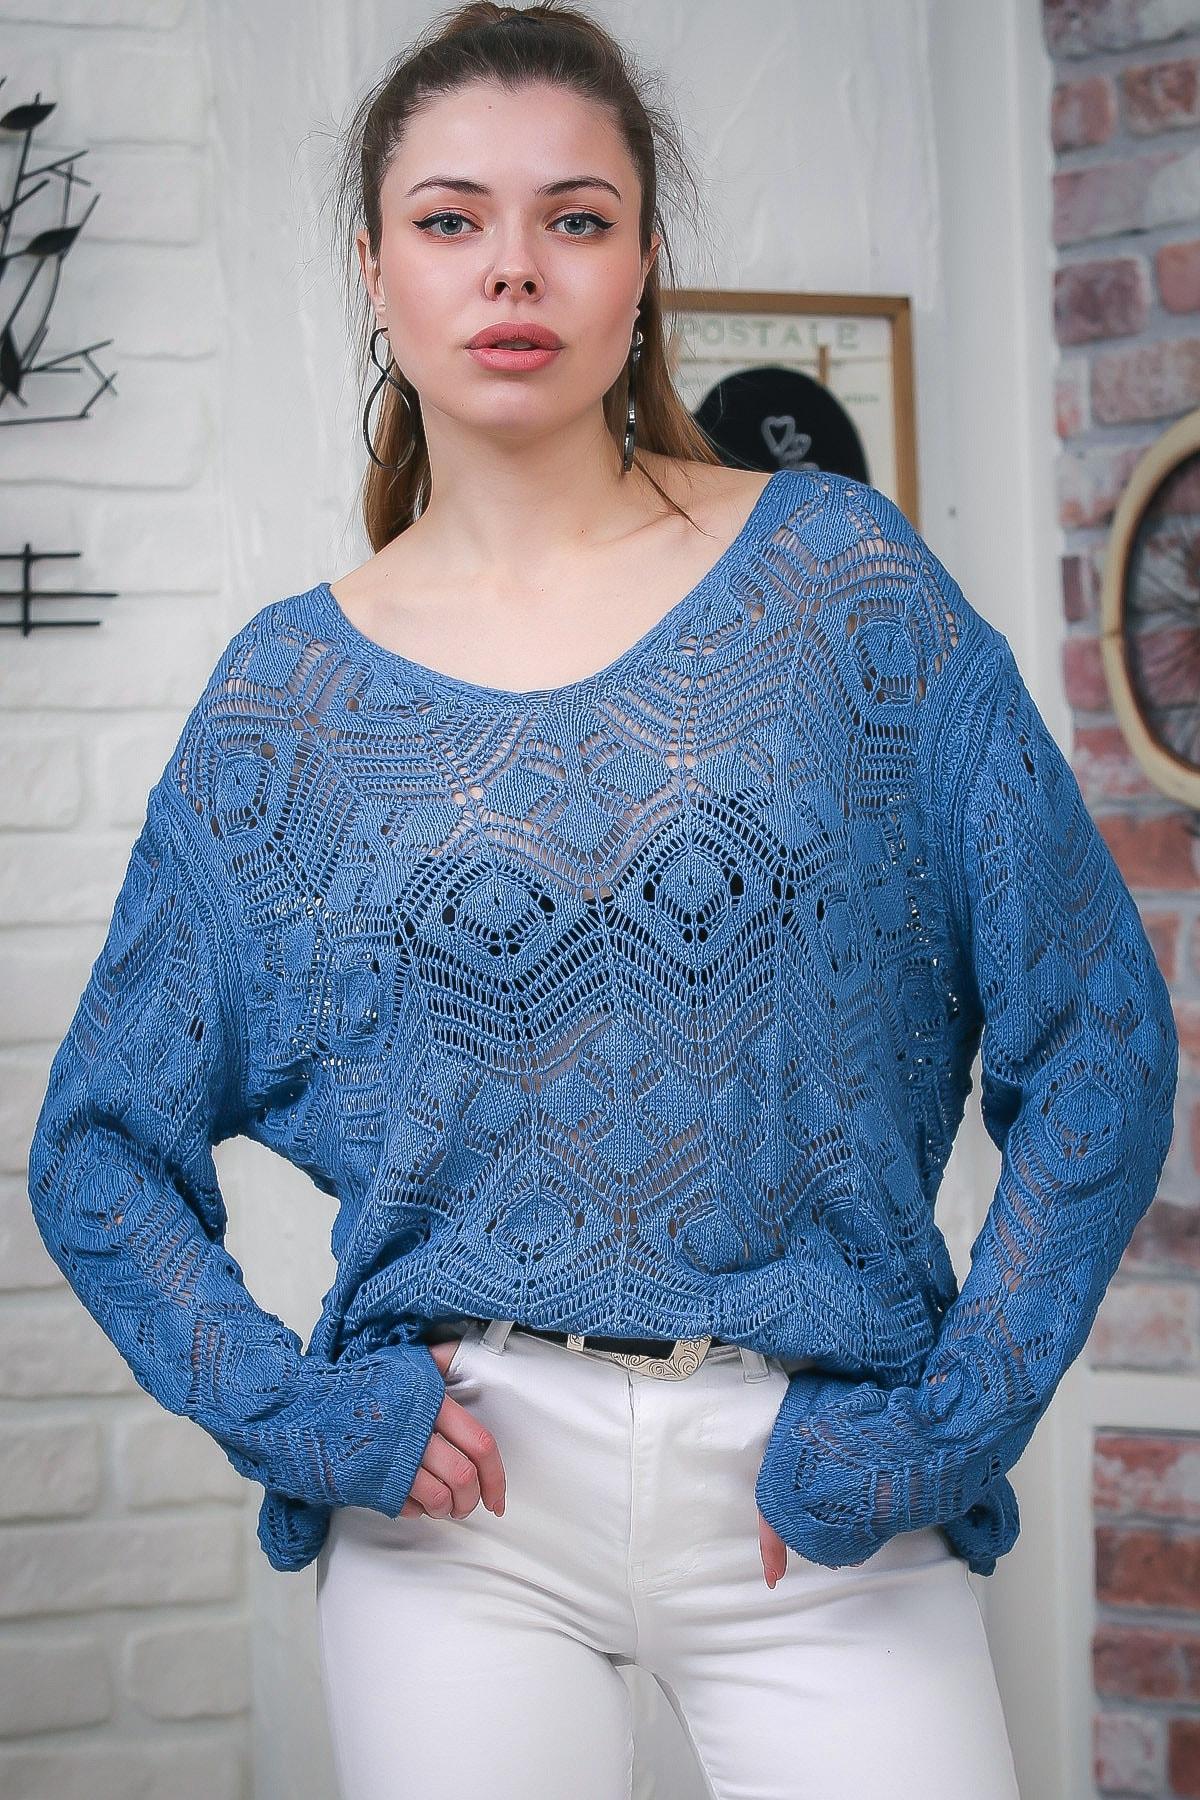 Chiccy Kadın Mavi V Yaka Ajurlu Salaş Triko Bluz M10010200BL95553 1